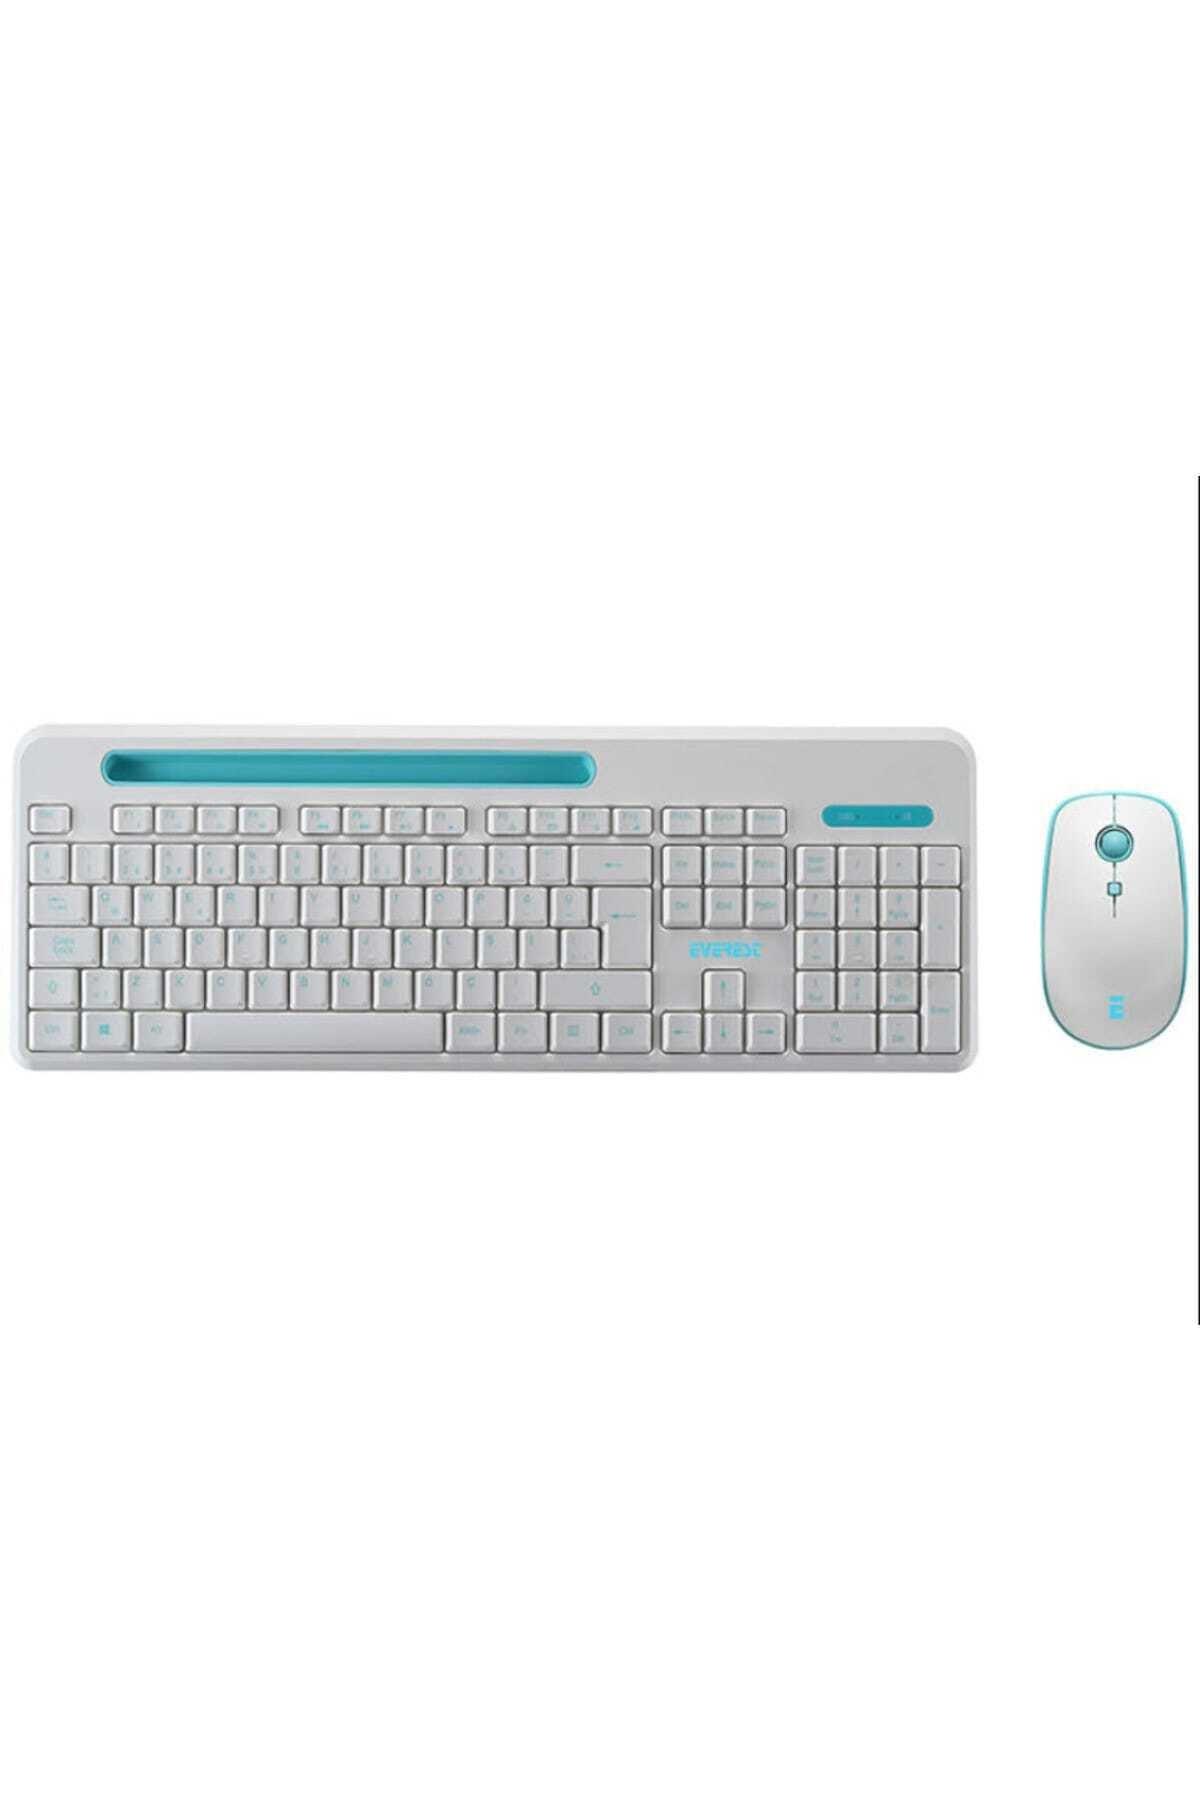 Everest ELITE KM-6388 Kablosuz Q Multimedia Klavye + Mouse Set Beyaz/Mavi 1